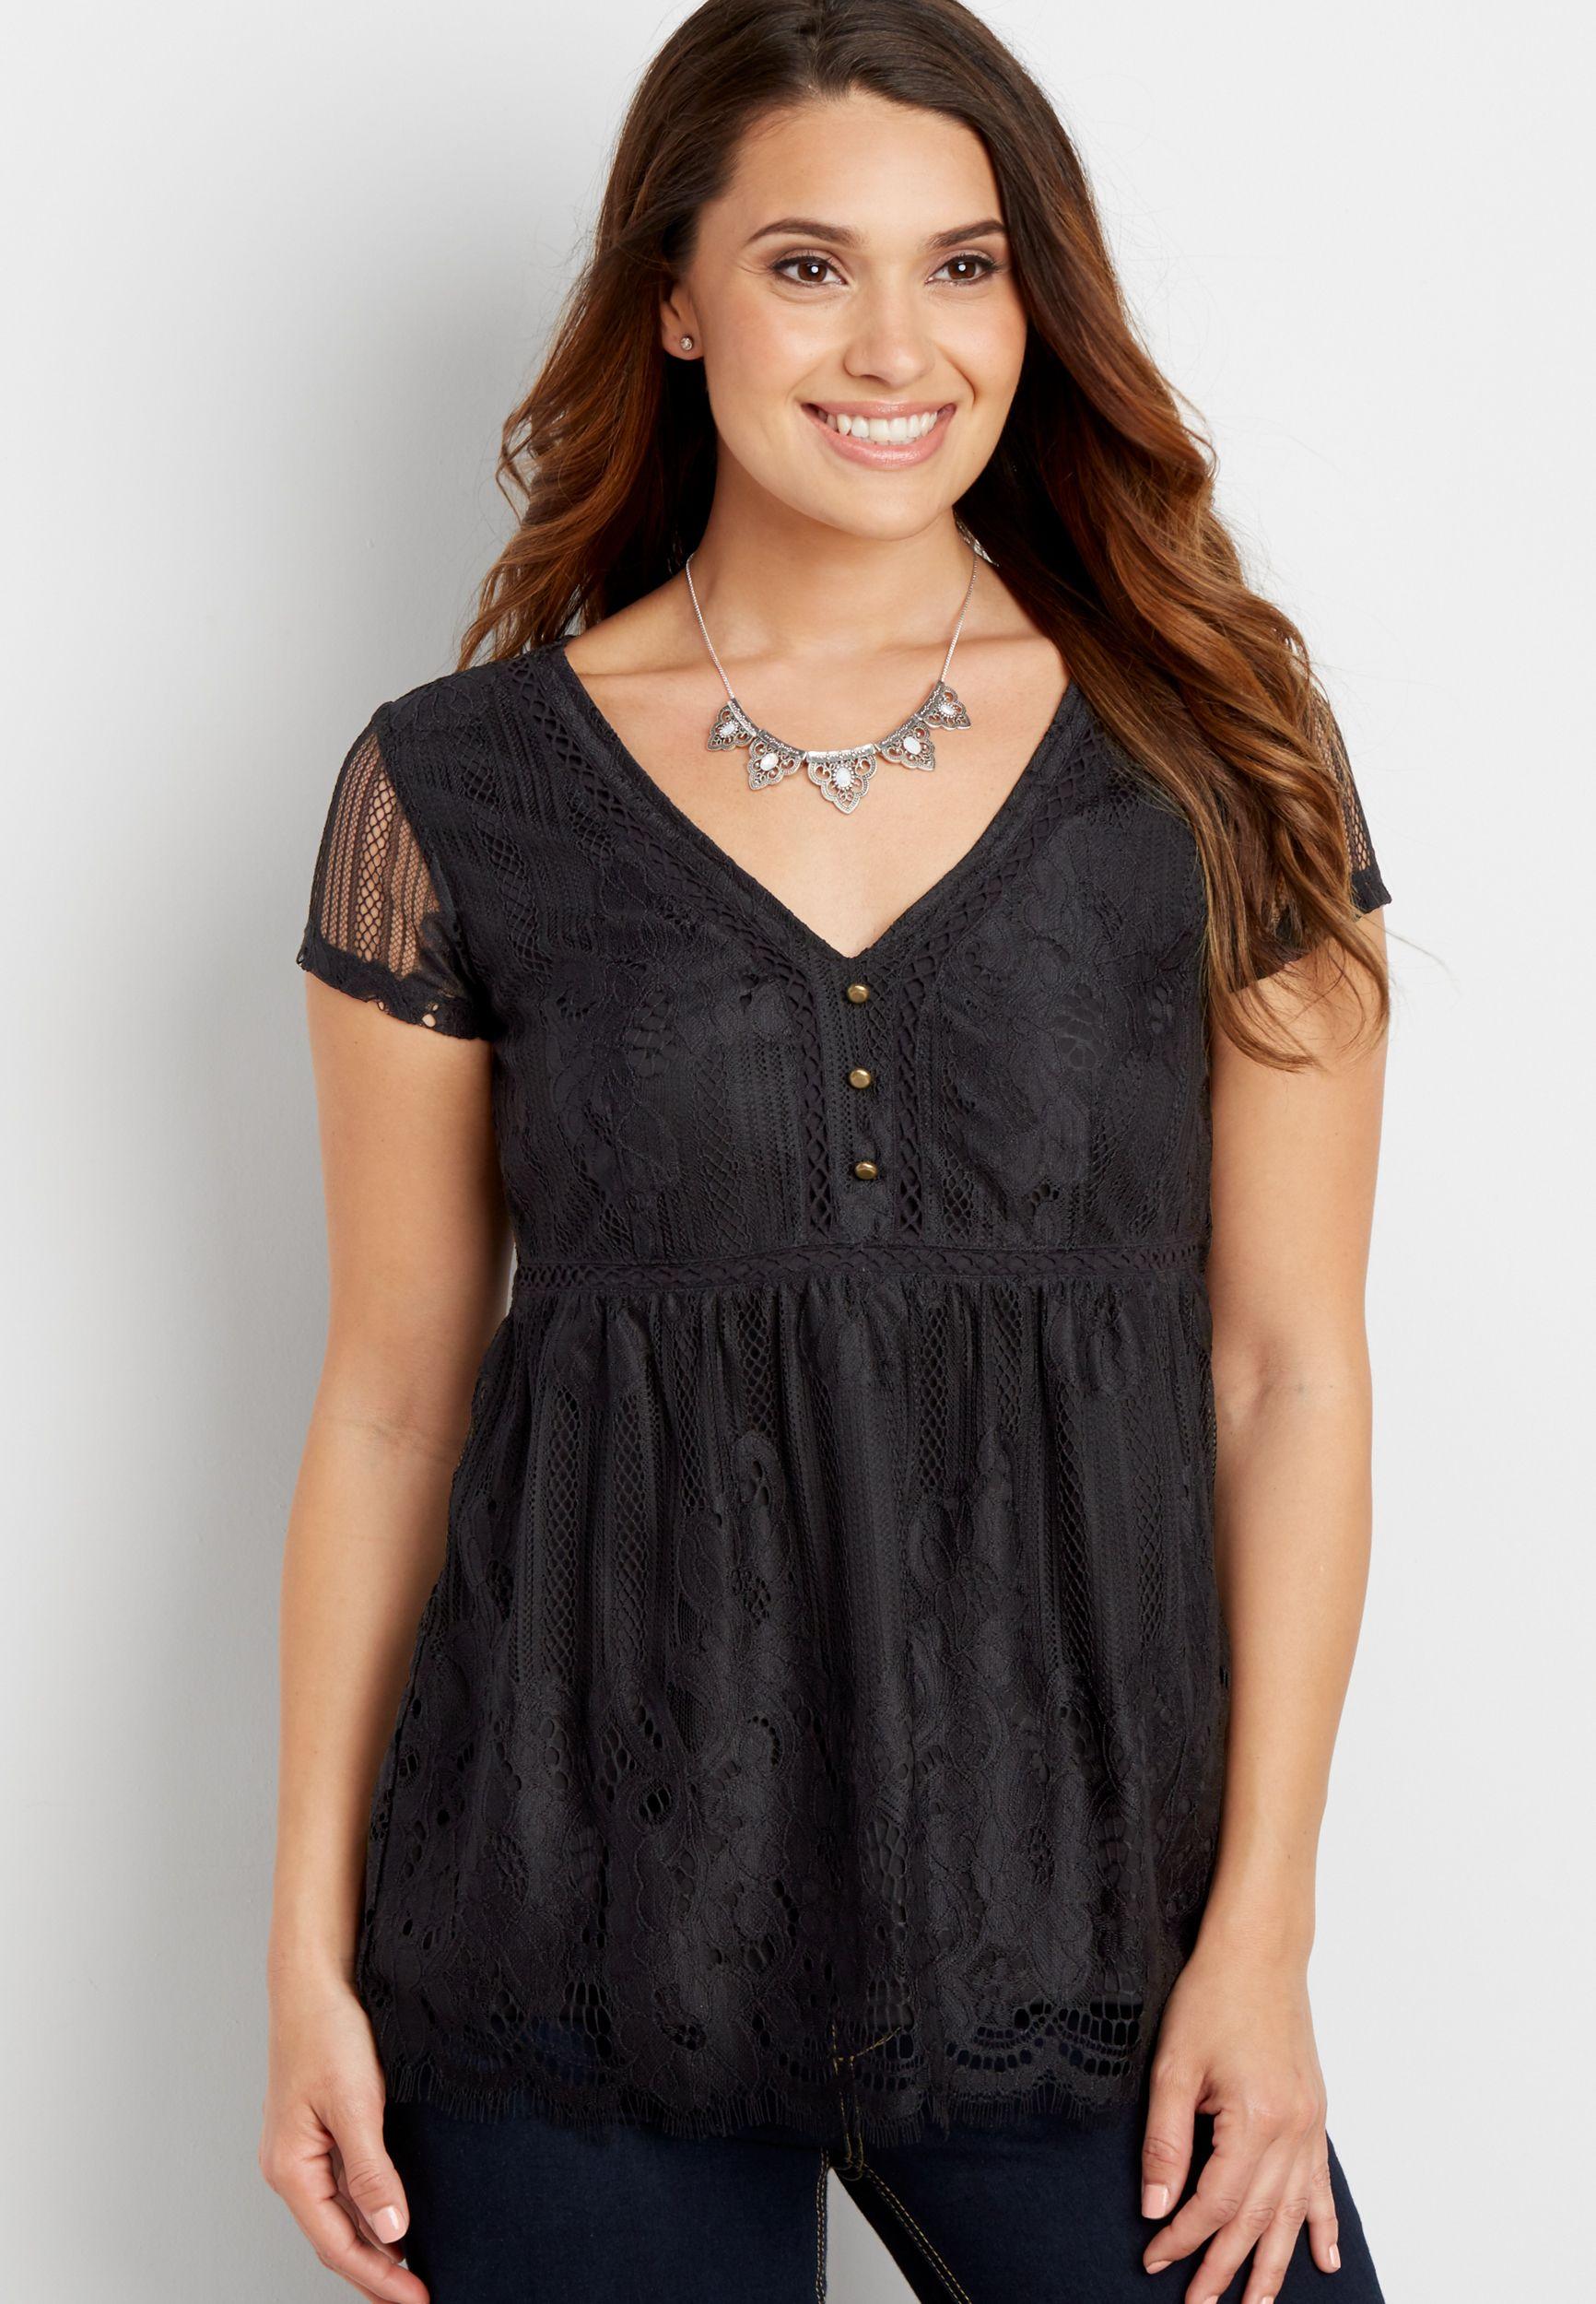 ed129e689f0 lace top with v-neckline (original price